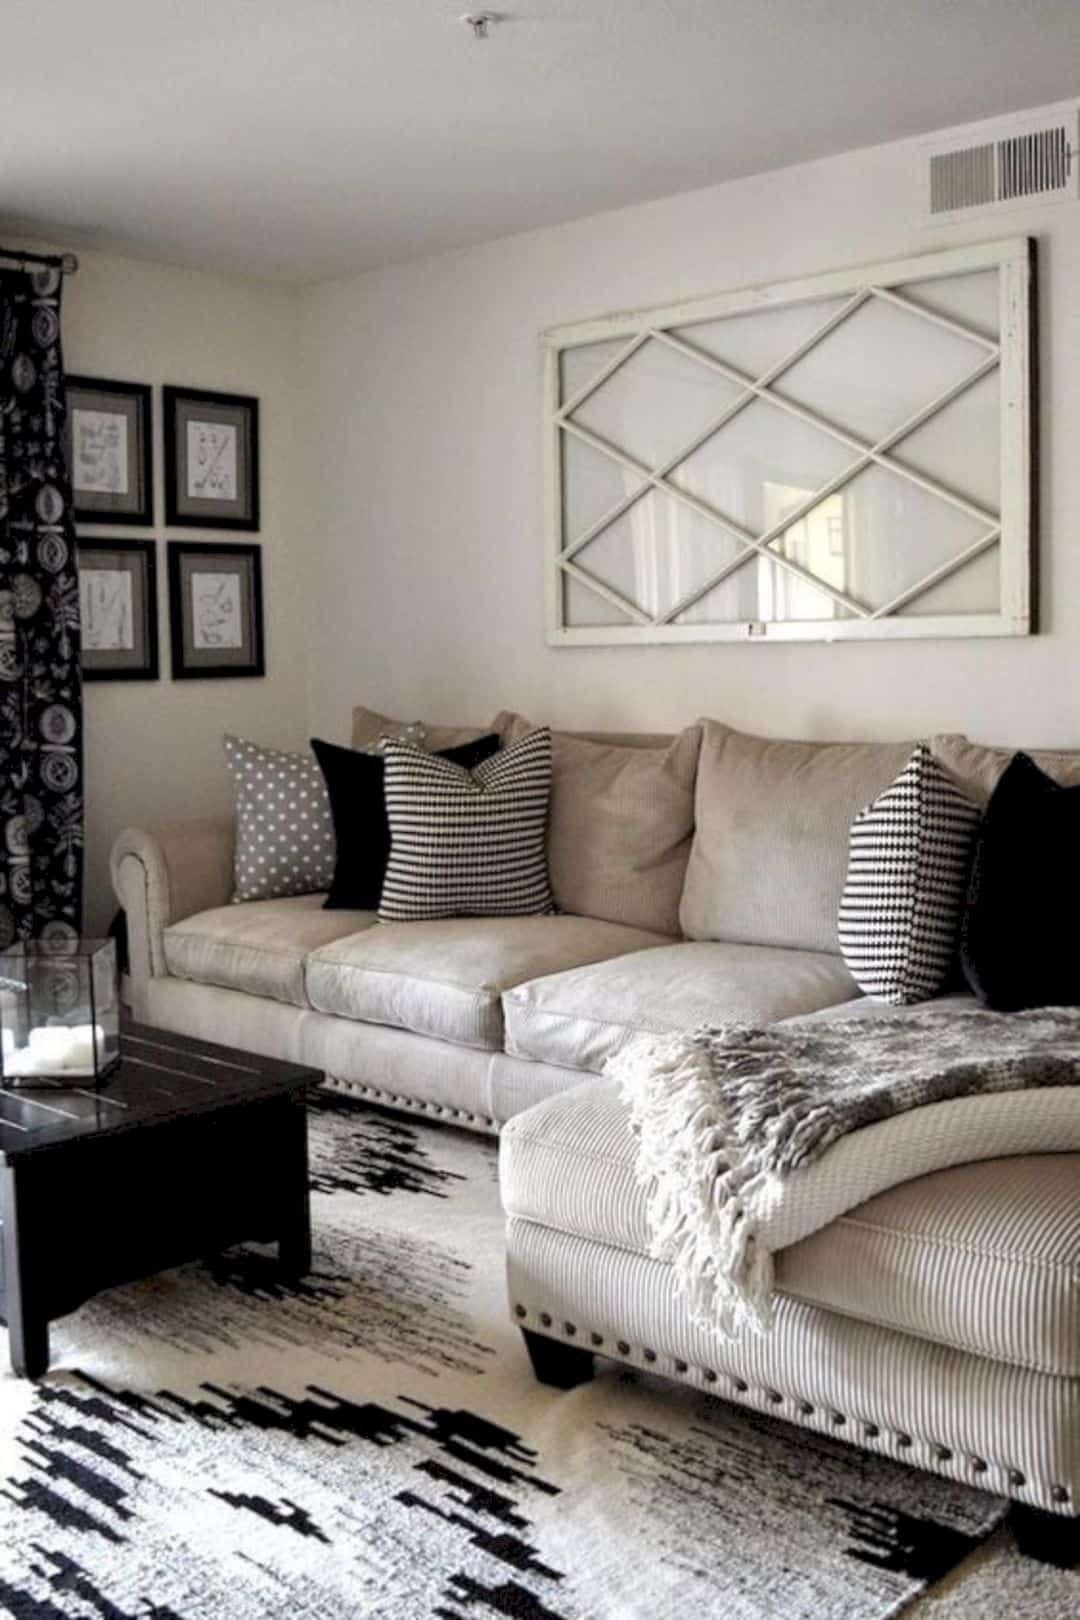 Living Room Wall Decor Ideas Lovely 16 Magnificent Living Room Walls Decorating Ideas